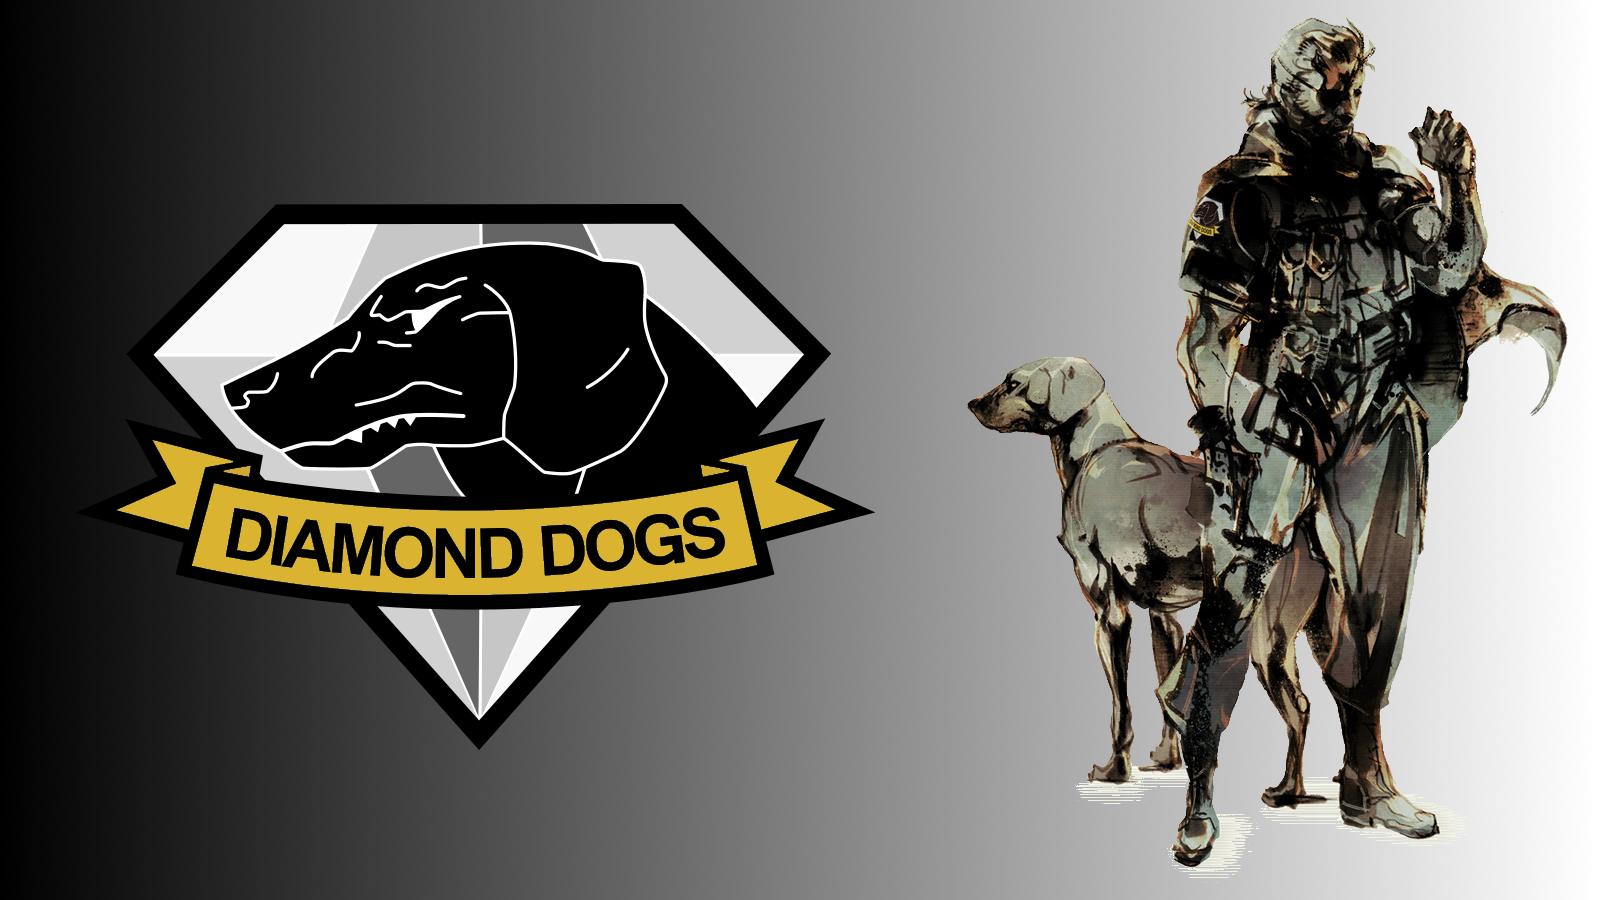 Diamond Dogs Wallpaper I Made Constructive Criticism Appreciated 1600x900